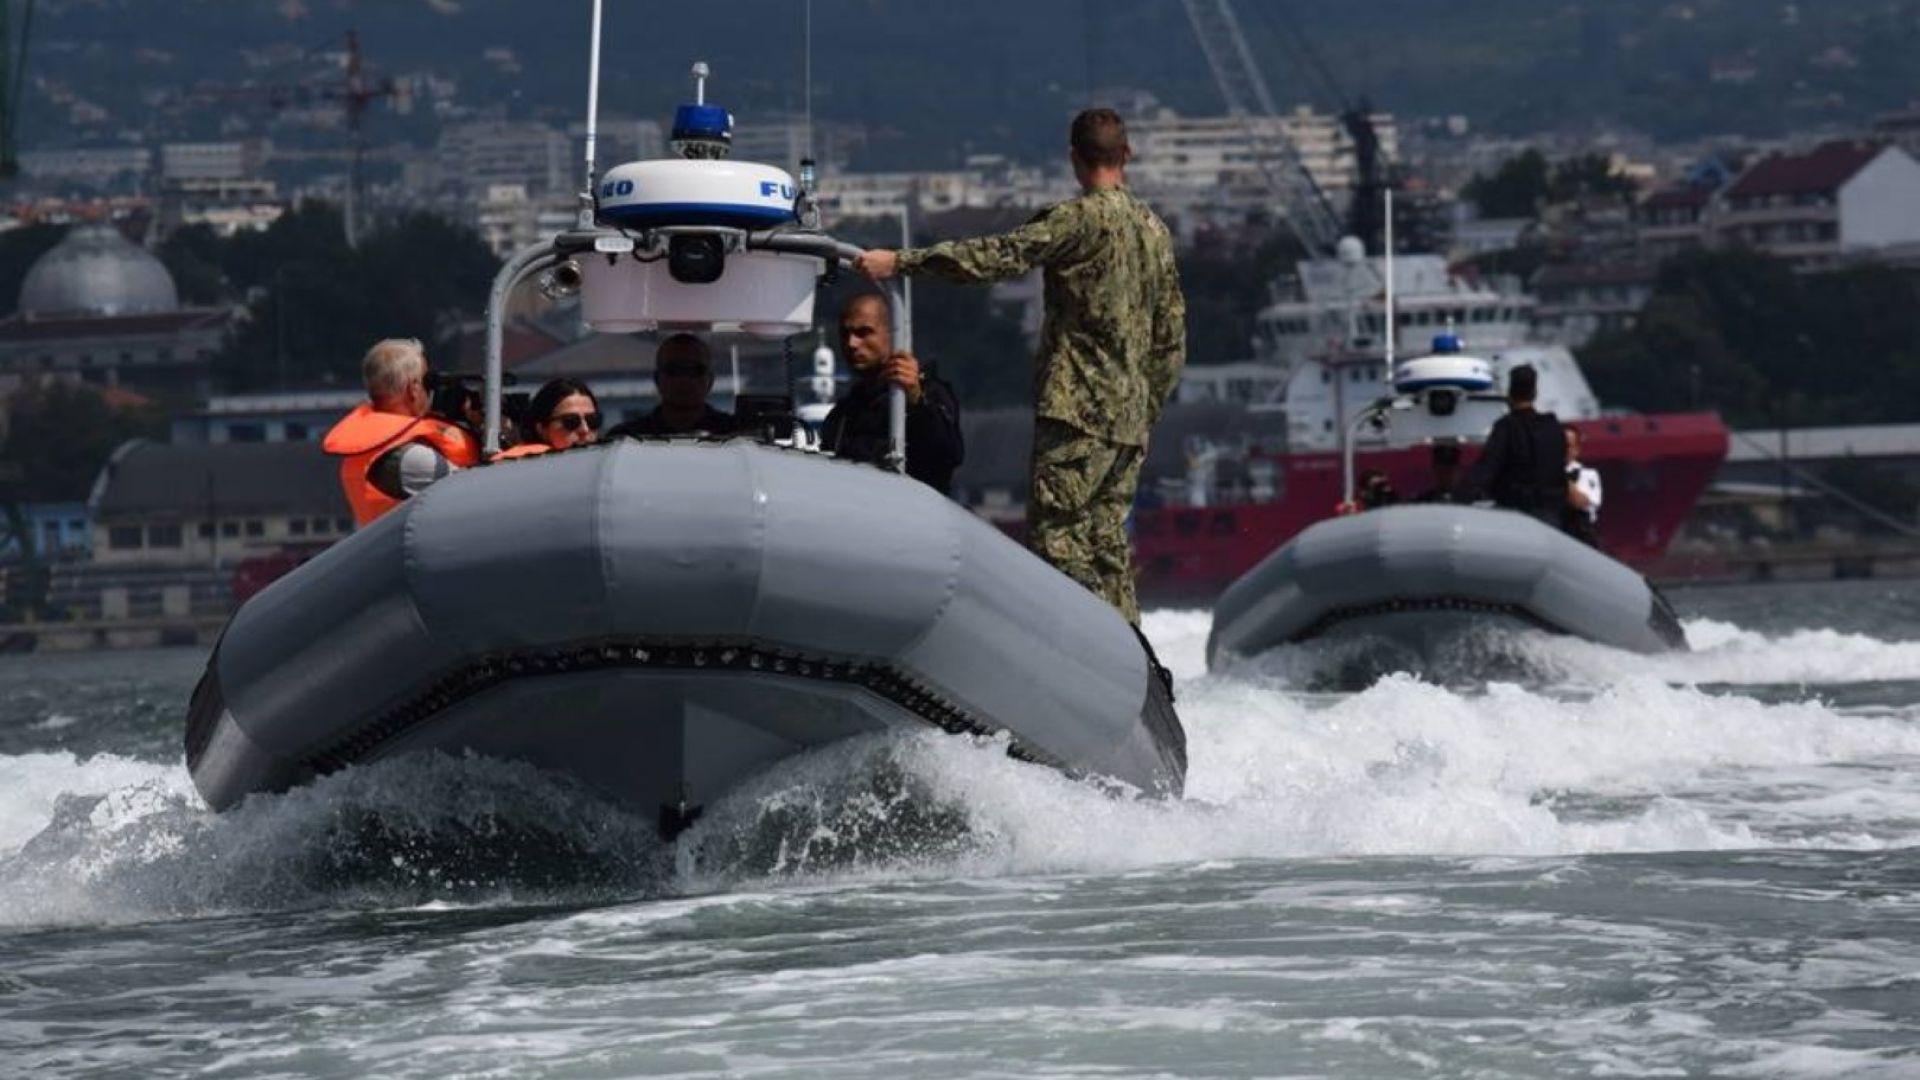 Военноморските сили получават безпилотни подводни апарати